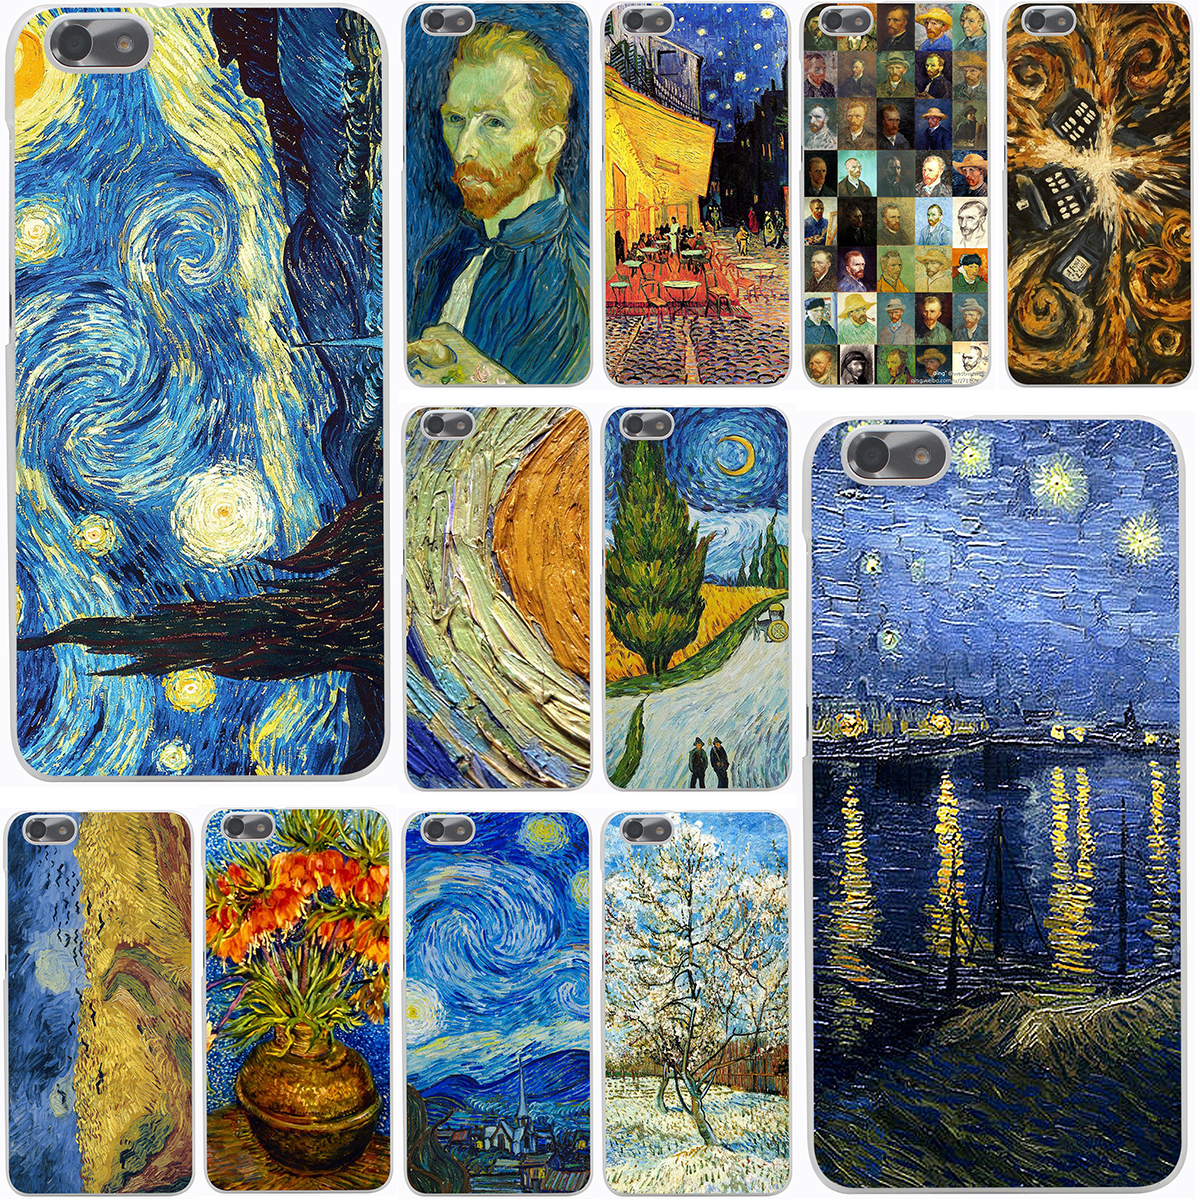 Van Gogh Tardis Harter Telefon-kasten für Huawei P10 P9 Plus P8 Lite...